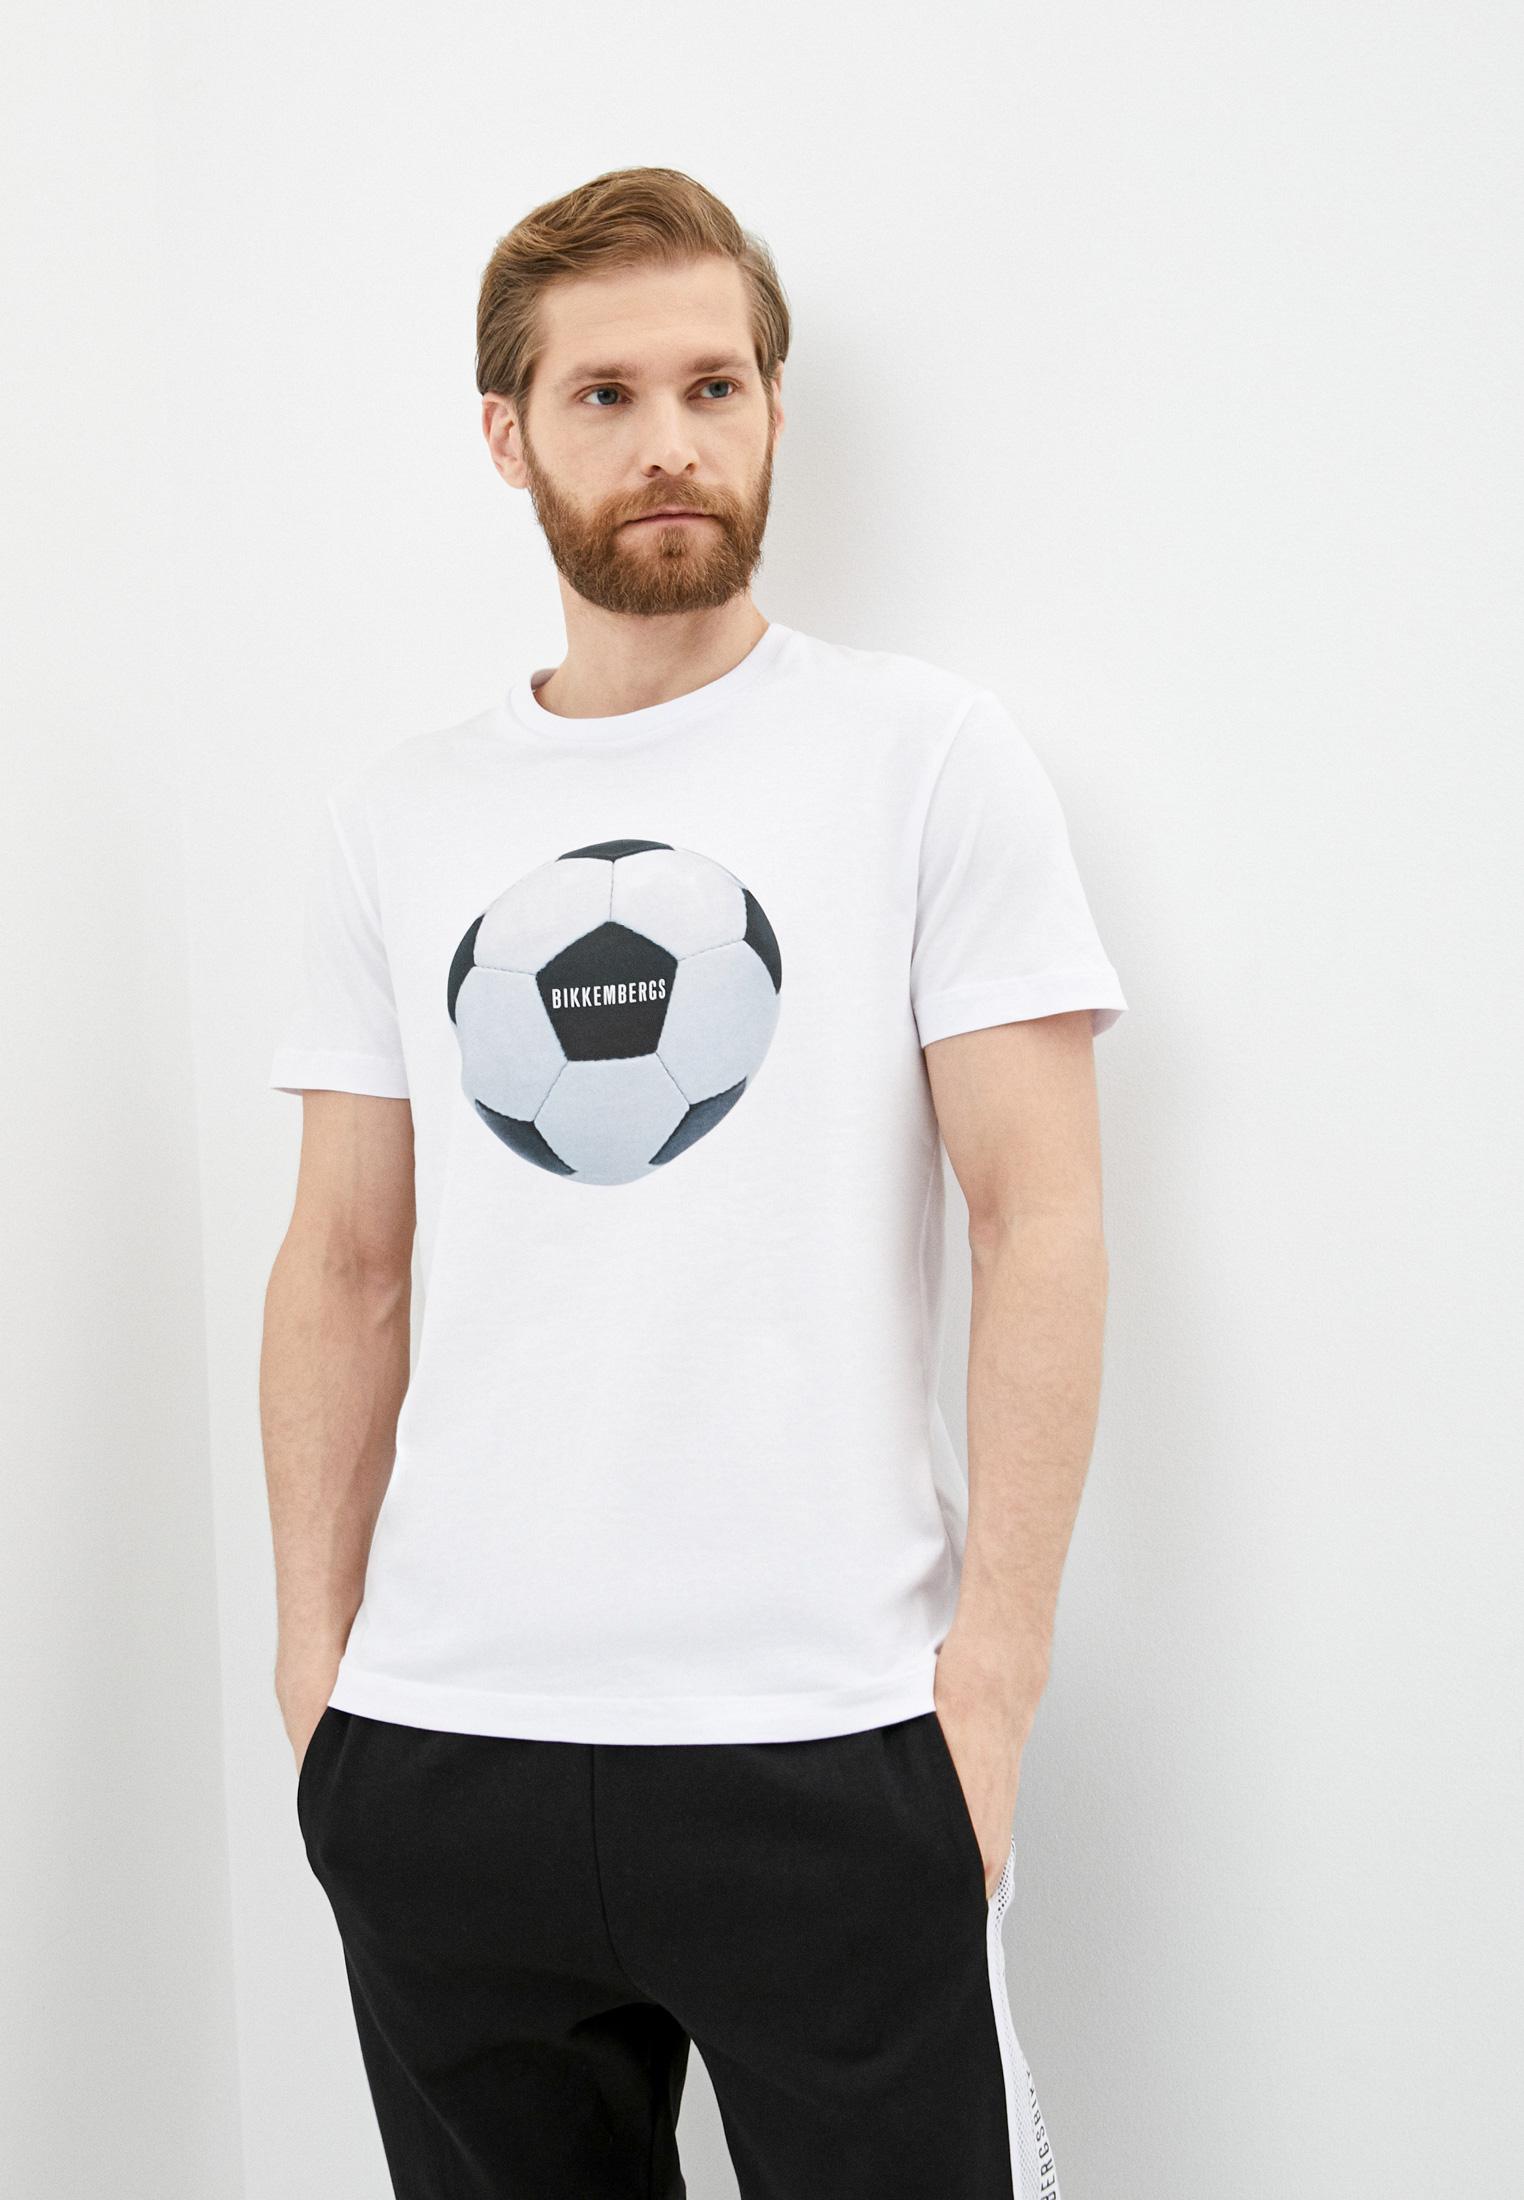 Мужская футболка Bikkembergs (Биккембергс) C 4 101 01 E 2231